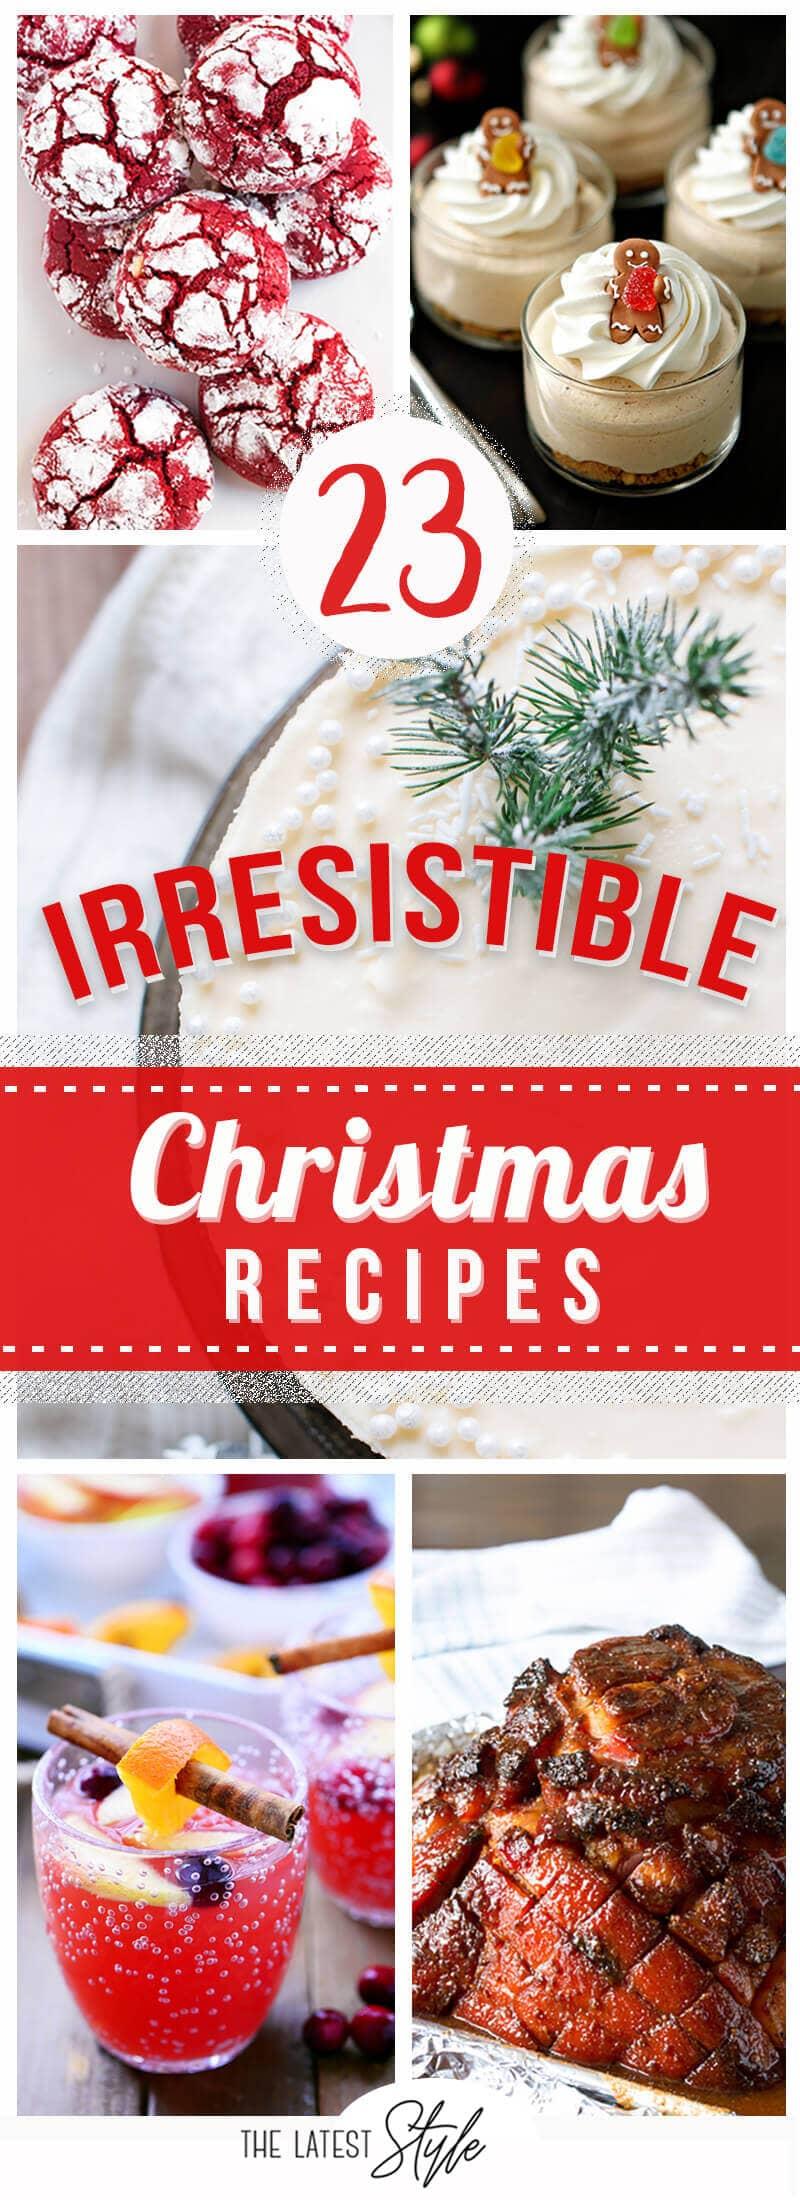 23 Christmas Recipes so Delicious Santa's Checking them Twice